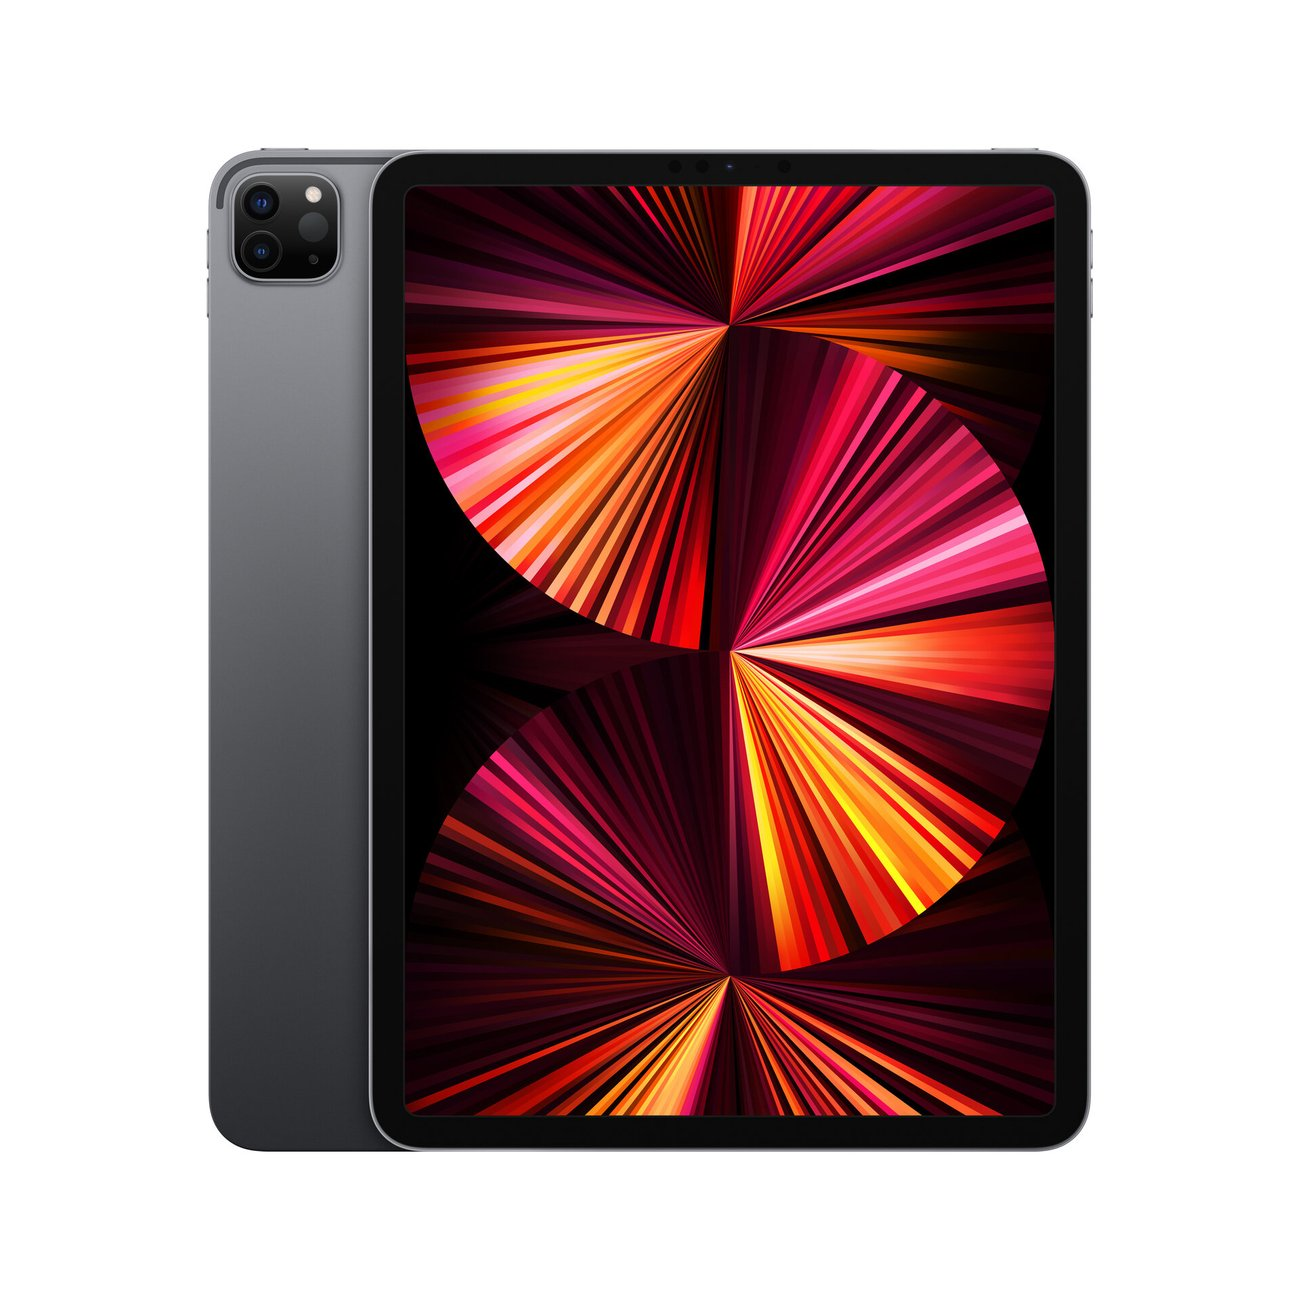 "Таблет Apple iPad Pro 12.9"" (5th) Wi-Fi 512GB Space Gray mhnk3 , 512 GB, 8 GB"